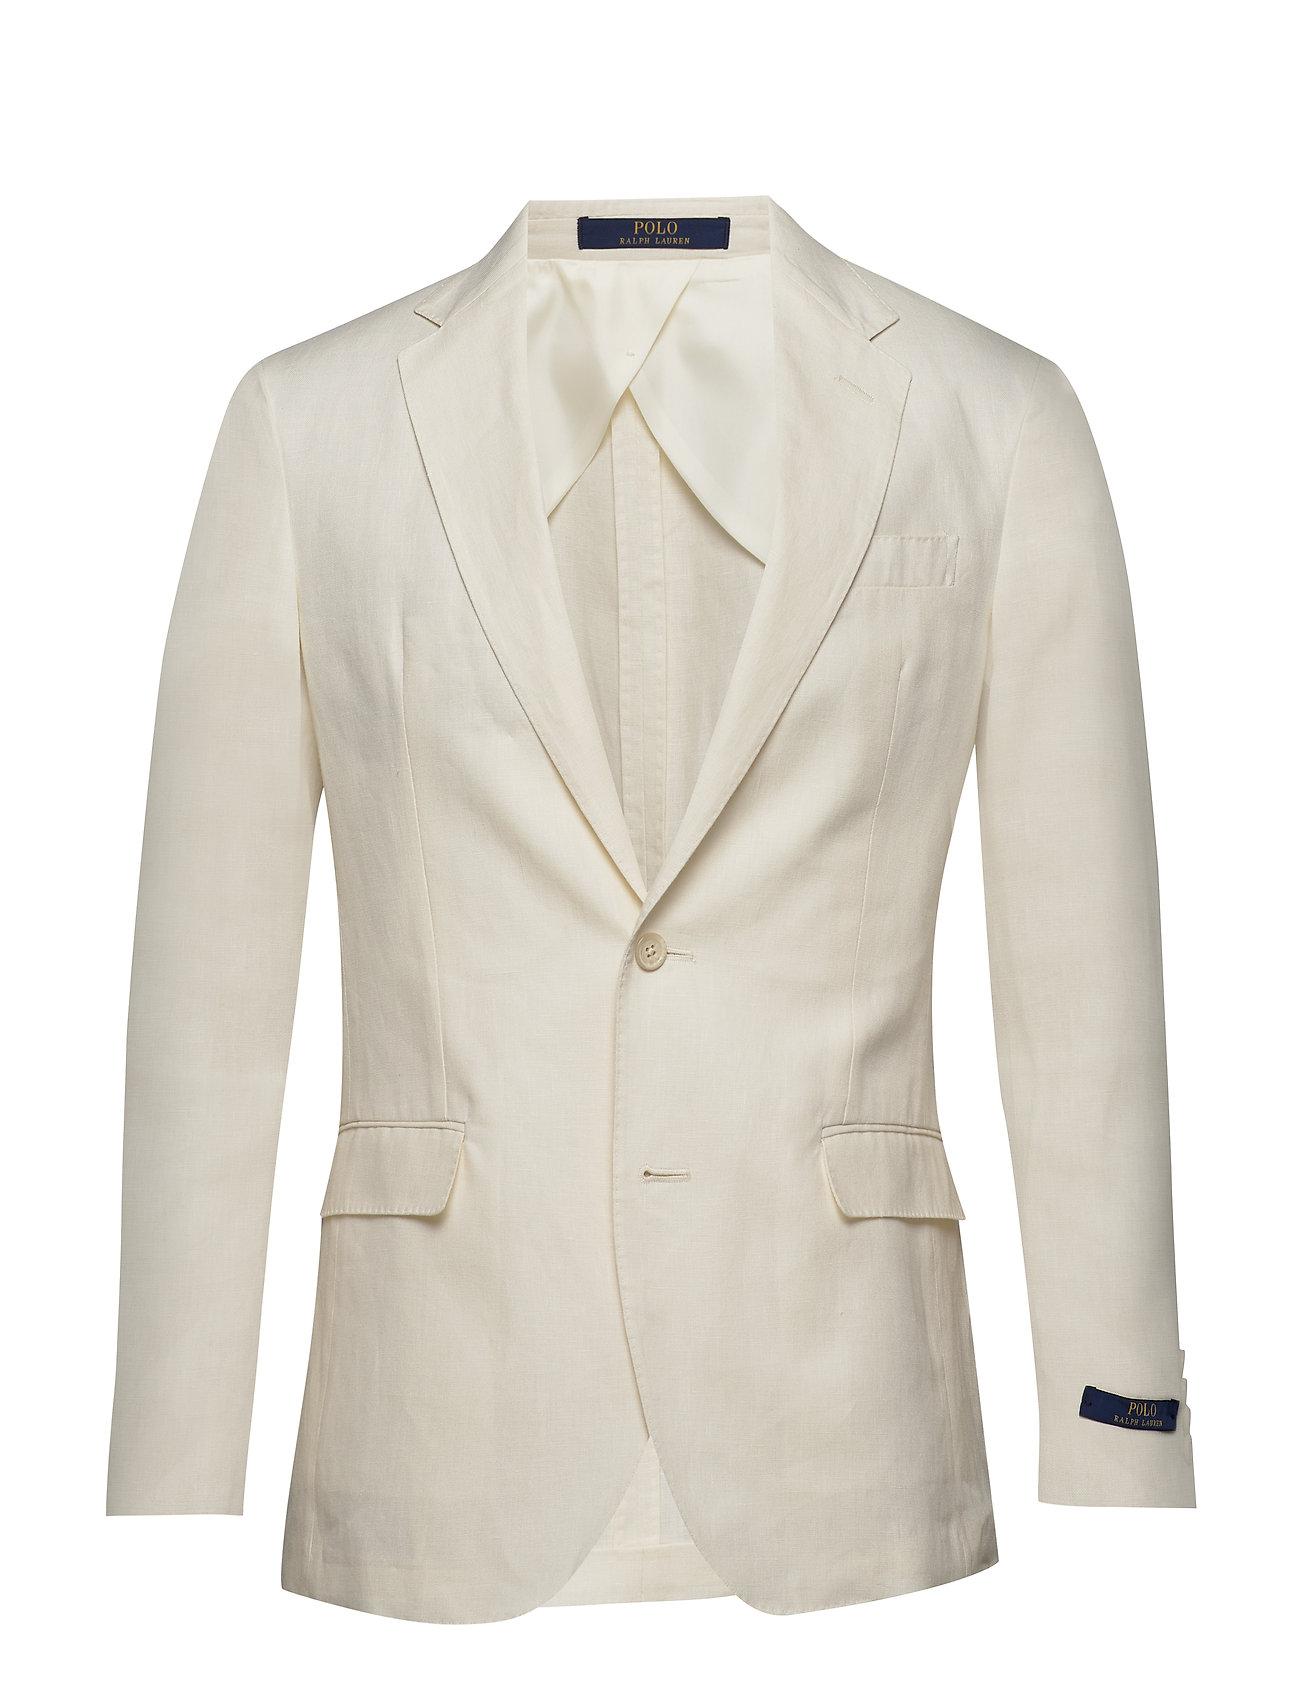 Polo Ralph Lauren Polo Soft Linen Sport Coat - LIGHT CREAM